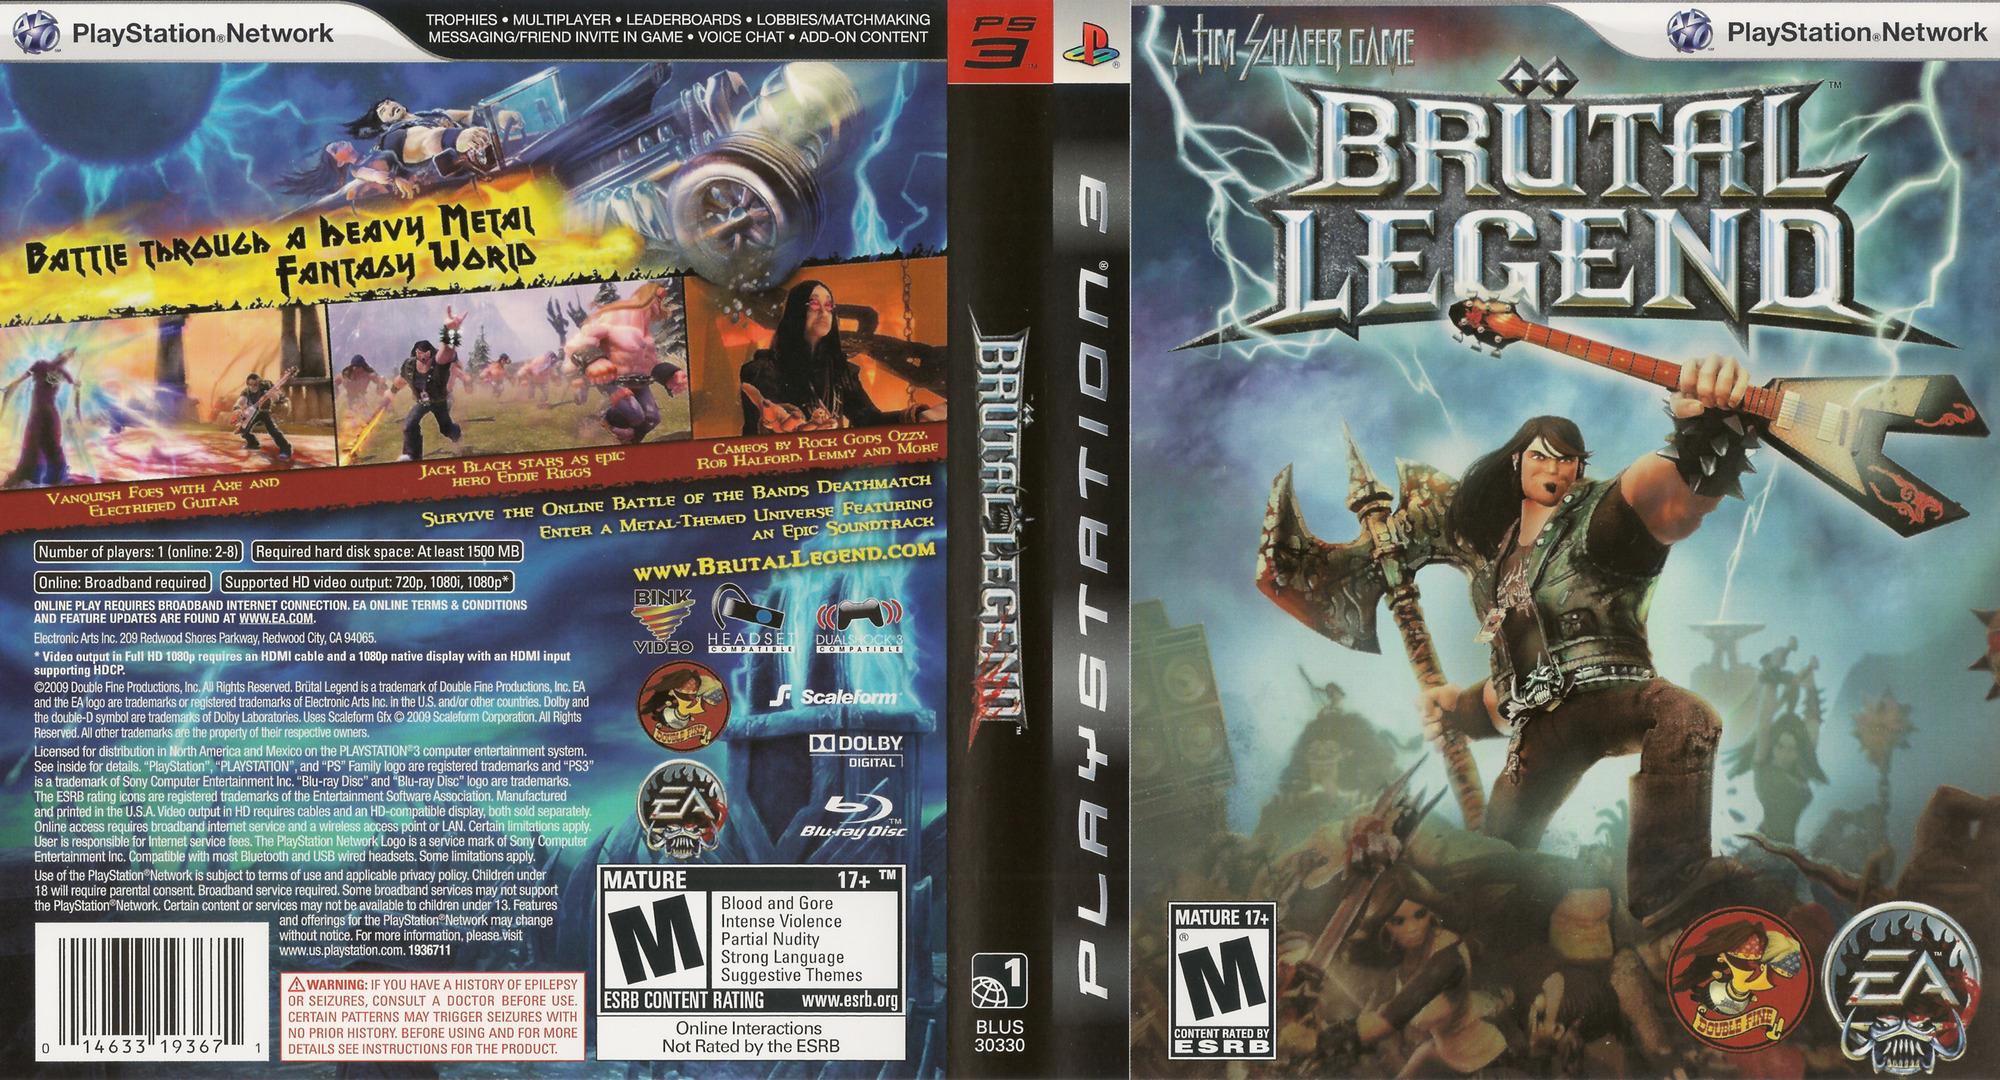 Brutal Legend PS3 coverfullHQ (BLUS30330)